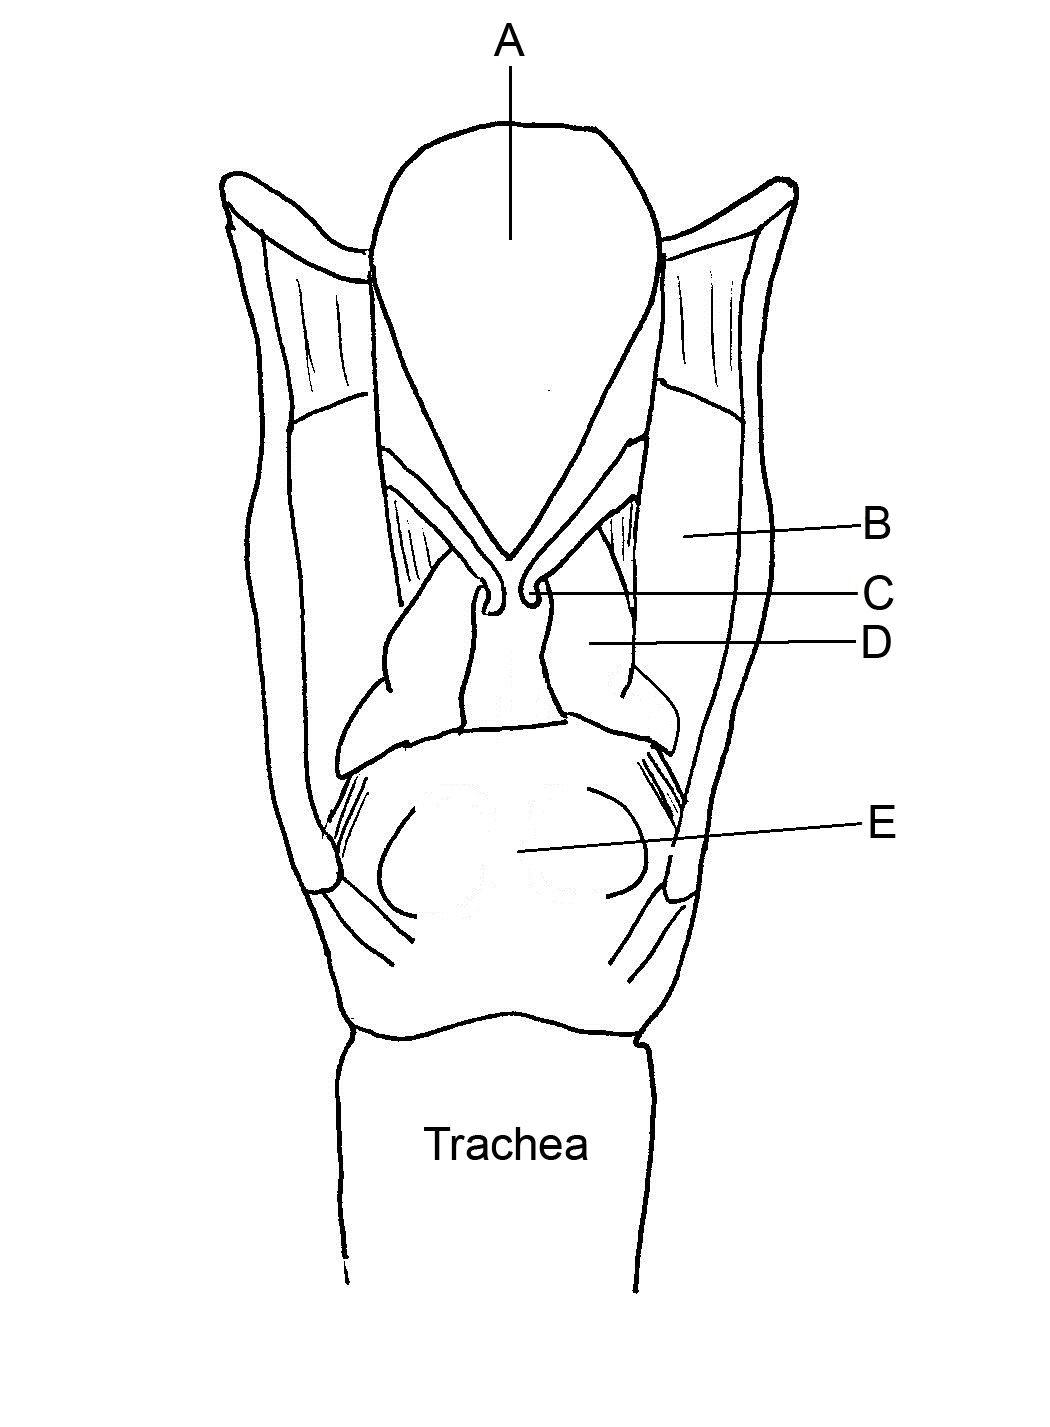 A = epiglottis; B = thyroid cartilage; C = corniculate